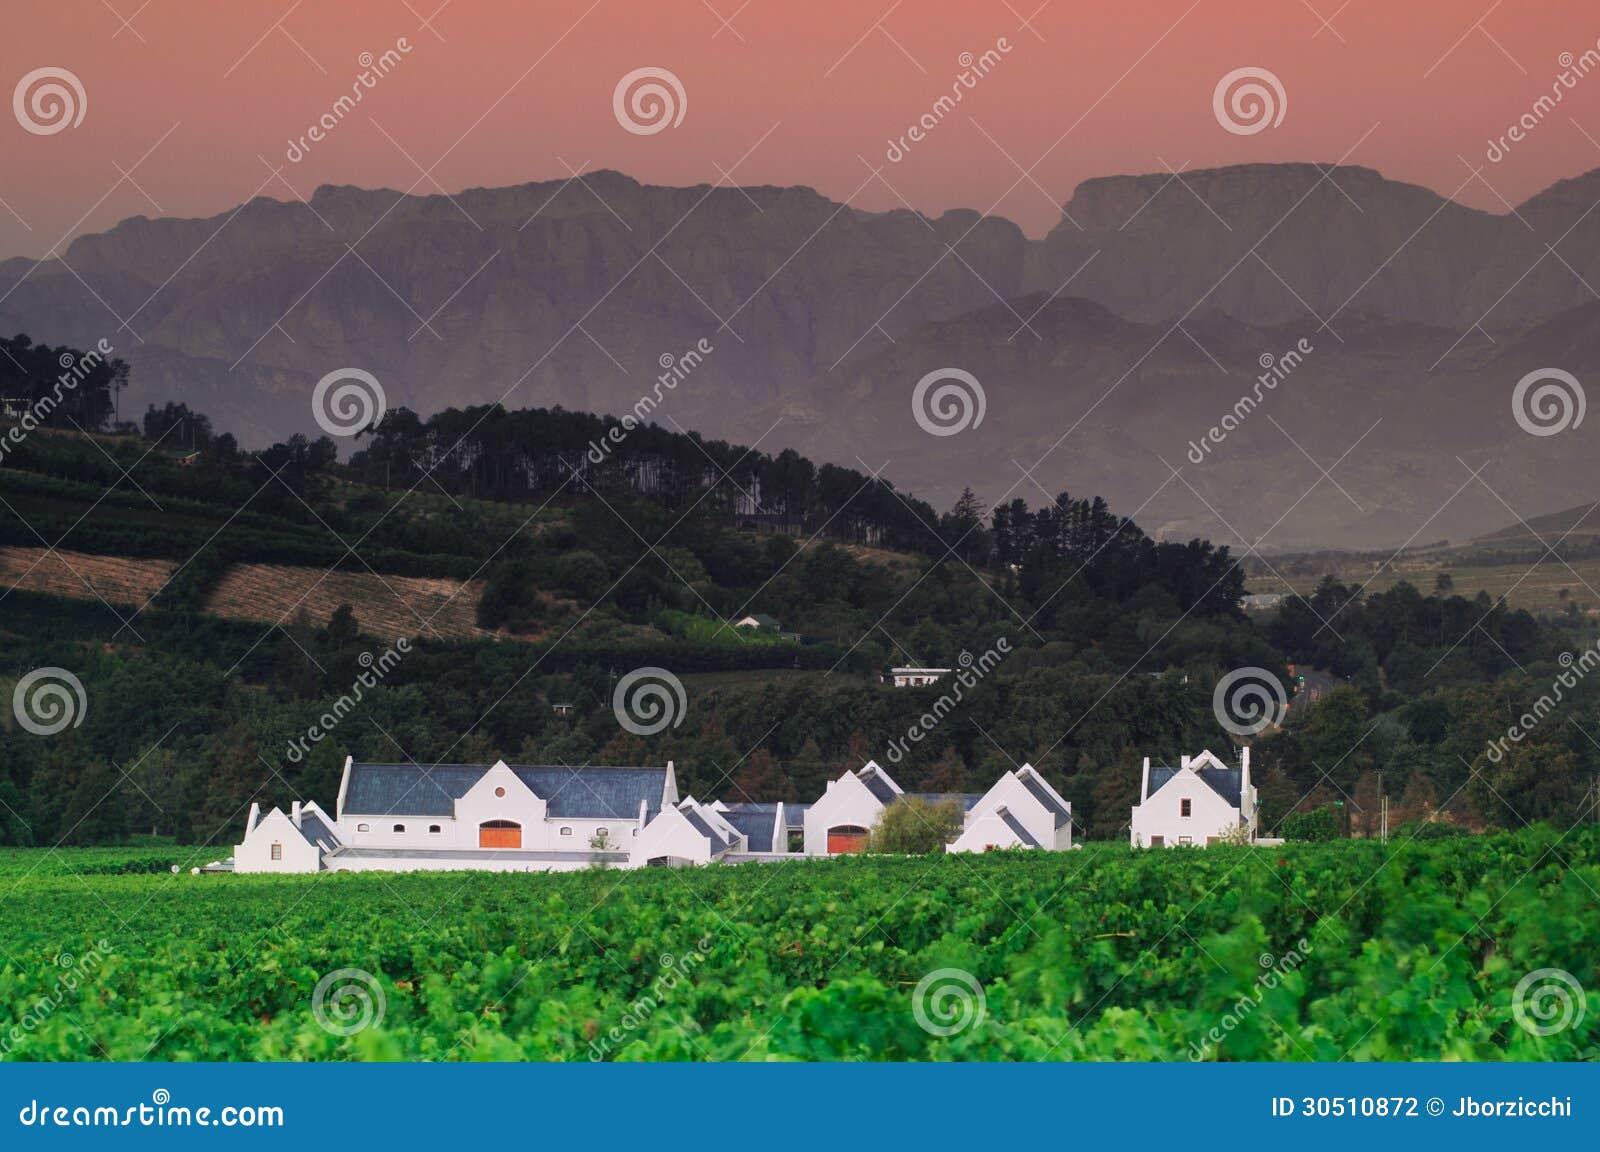 Landscape image of a vineyard, Stellenbosch, South Africa.